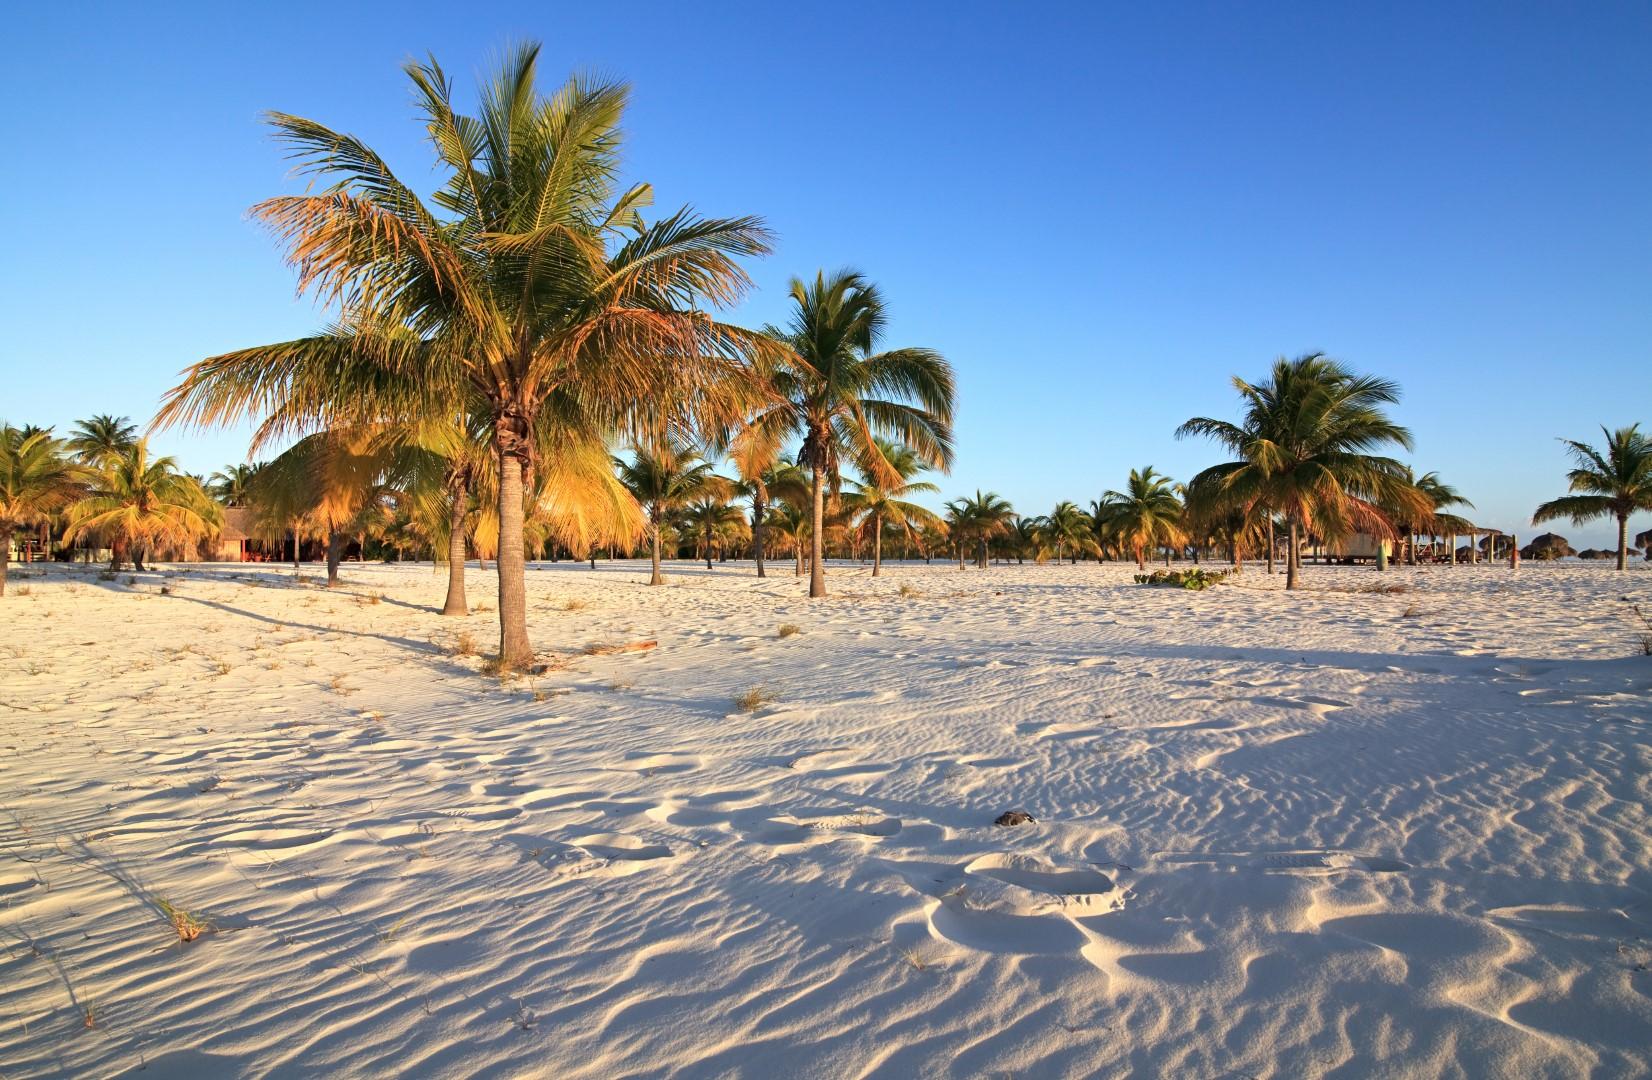 Playa Sirena on Cayo Largo. Cuba.